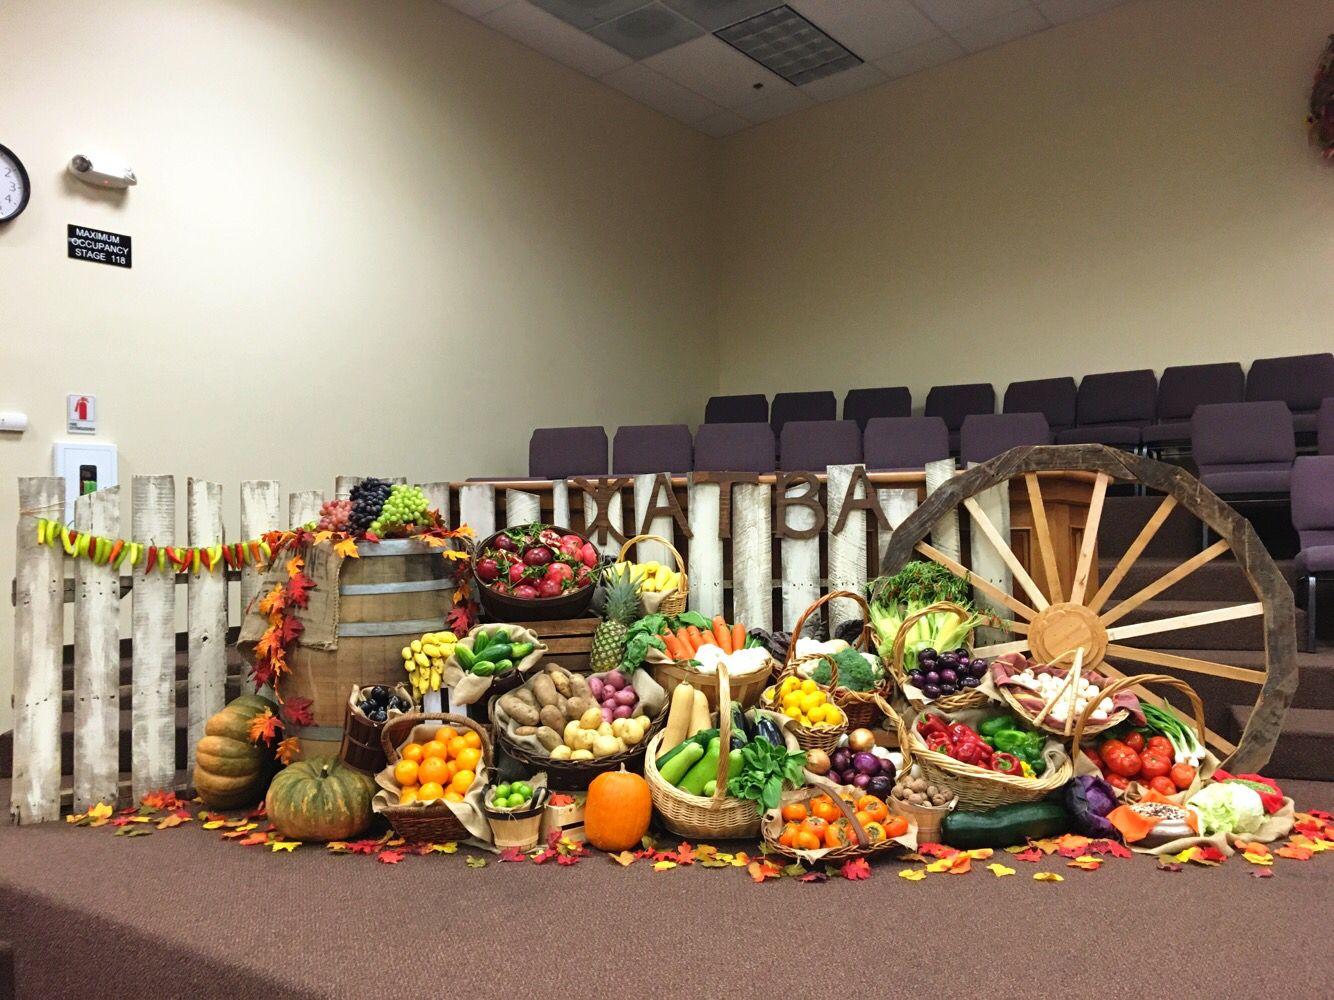 Church Harvest Autumn Fall  D0 B6 D0 B0 D1 82 D0 B2 D0 B0  D0 B2  D1 86 D0 B5 D1 80 D0 Ba D0 B2 D0 B8 2015  D0 Be D1 81 D0 B5 D0 Bd D1 8c